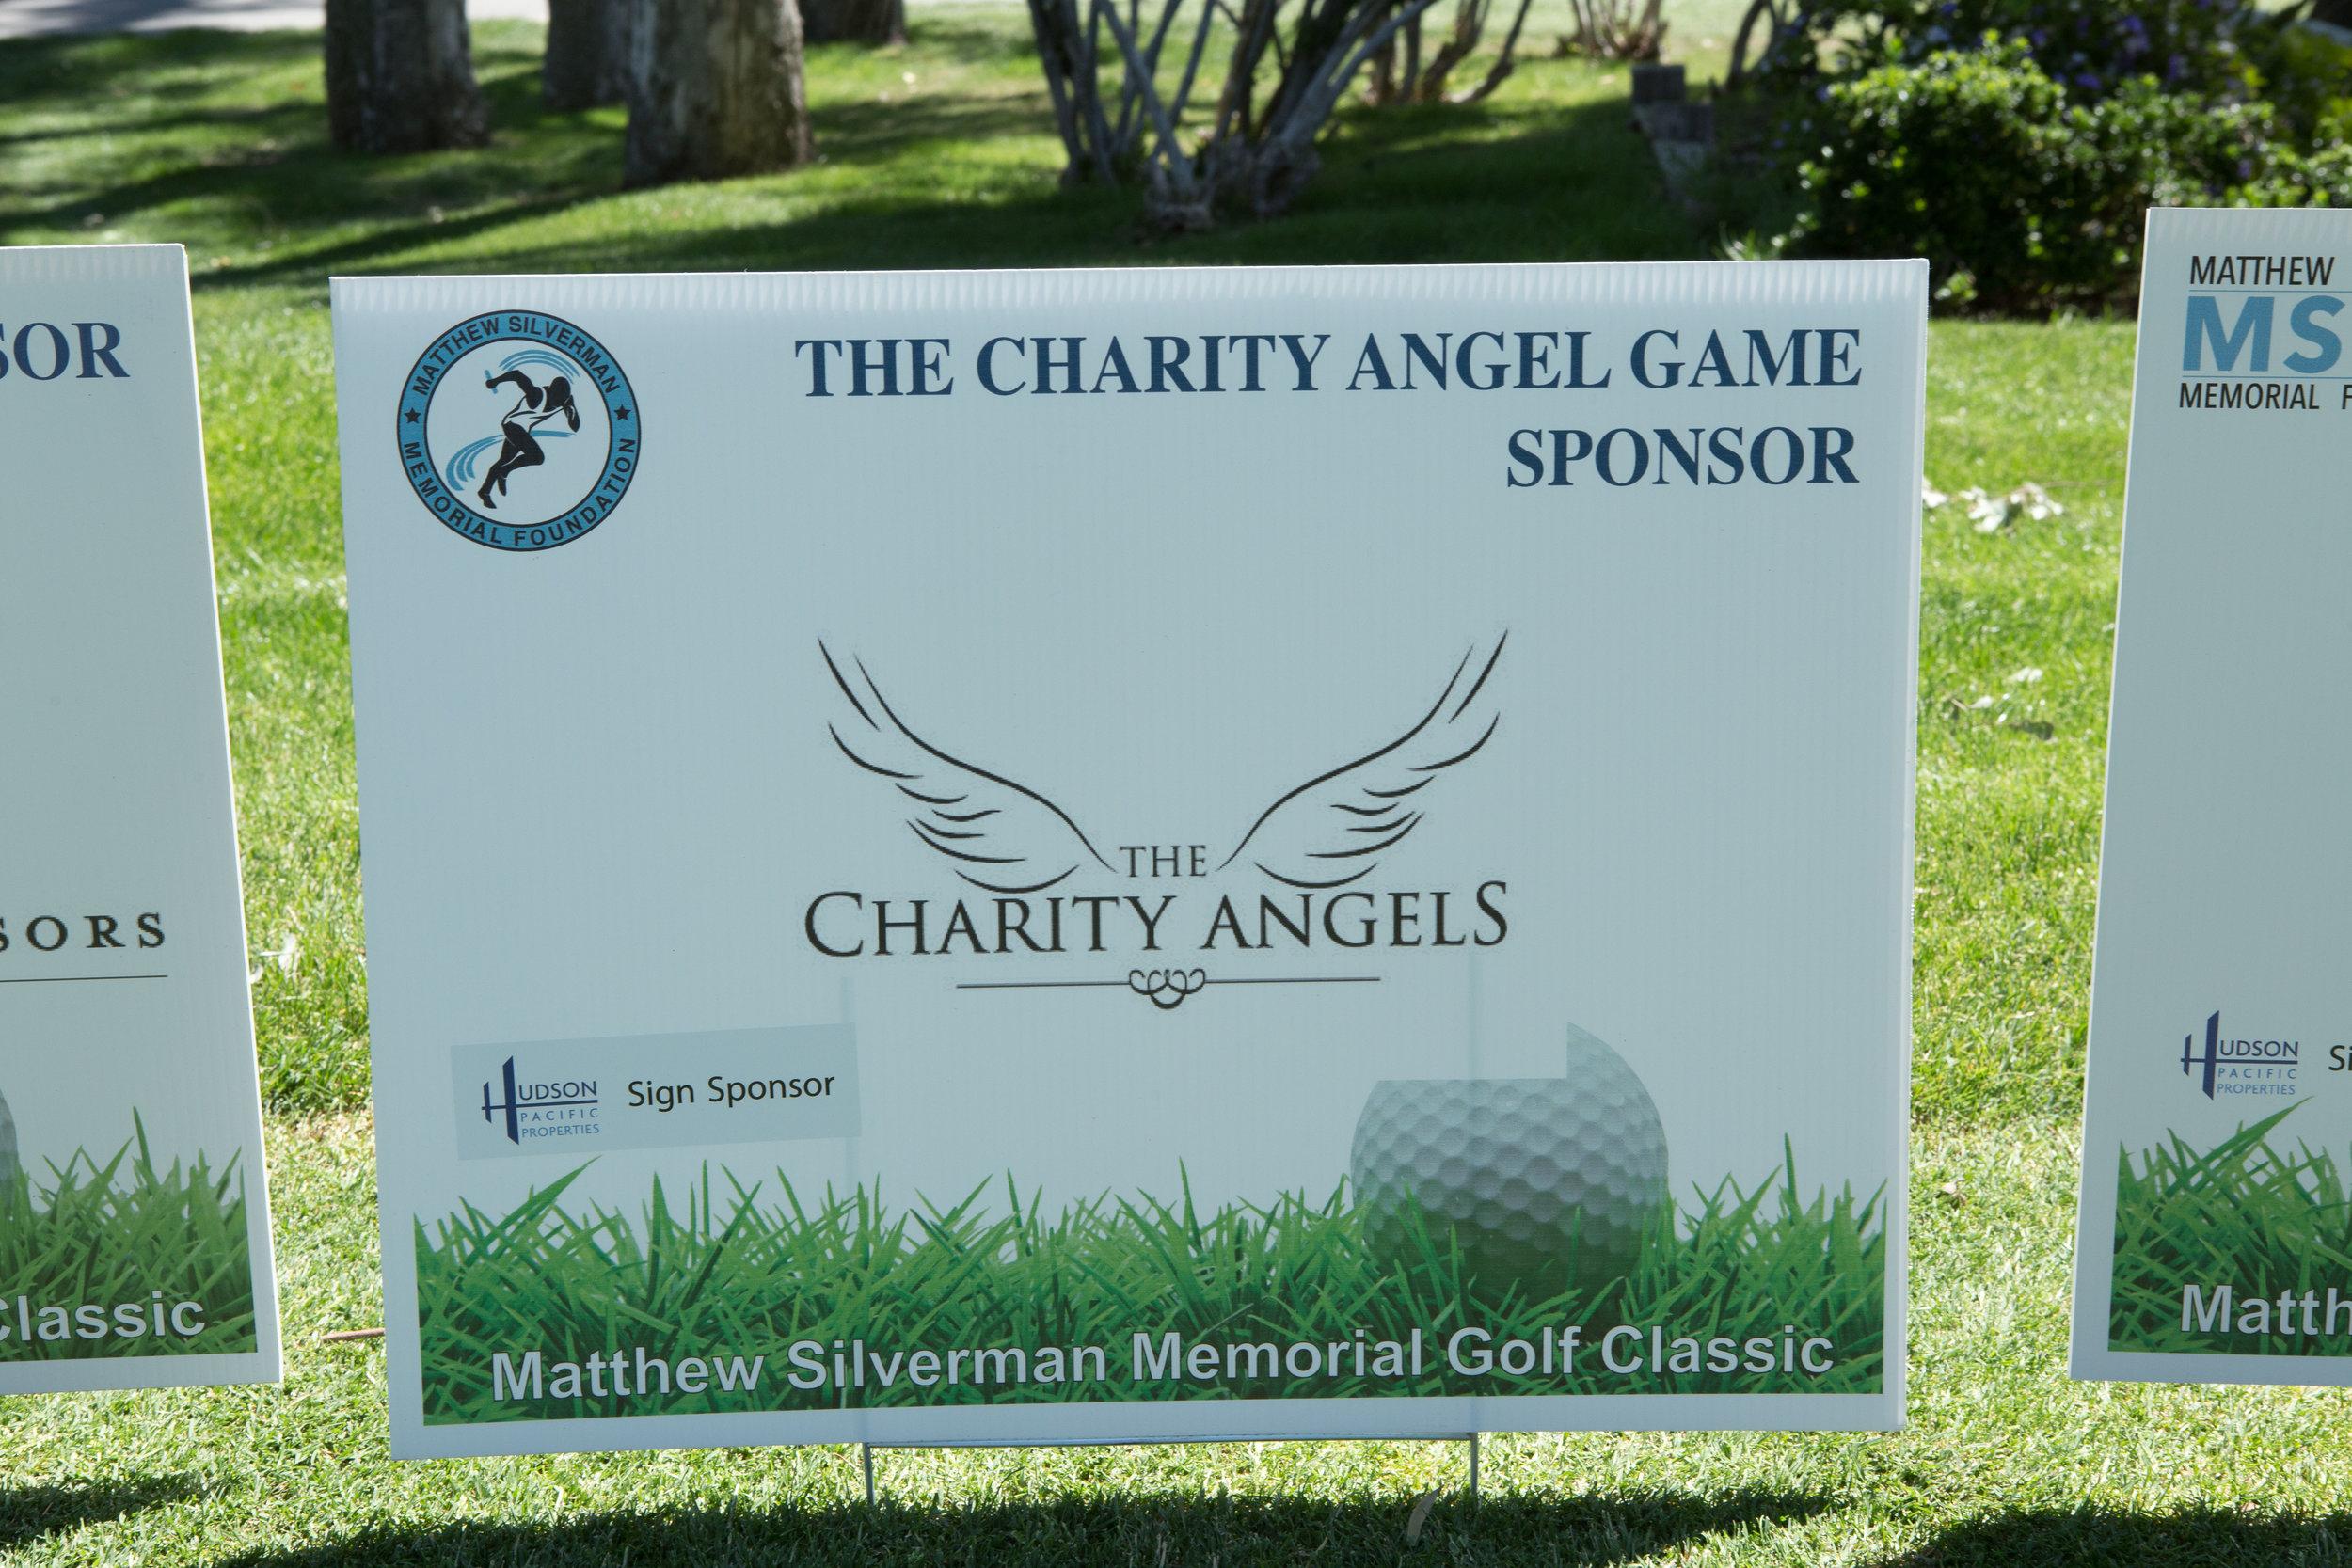 IMG_7926-SPONSOR SIGN-Charity Angels.jpg